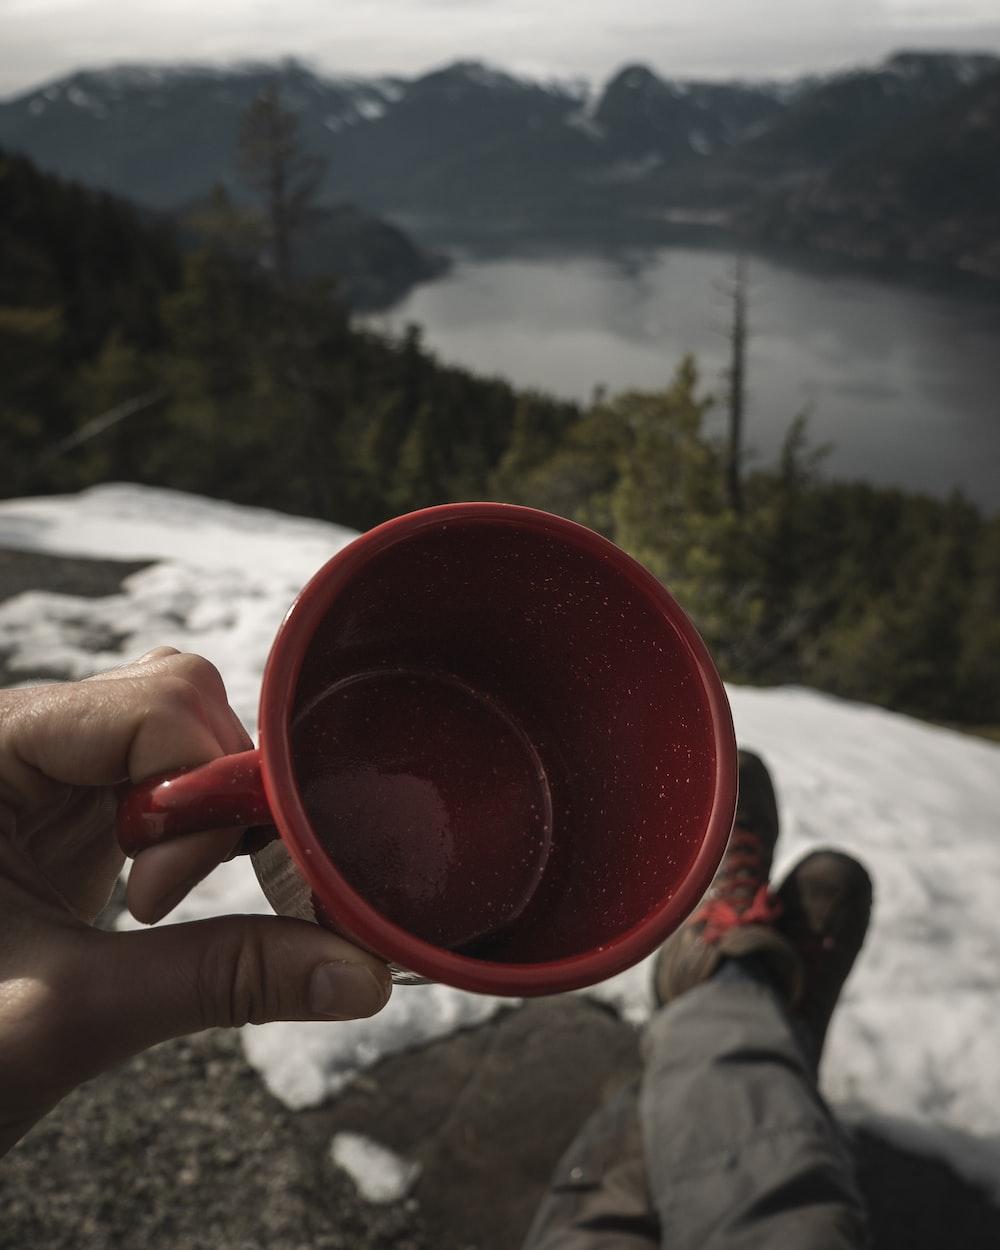 person holding red ceramic mug